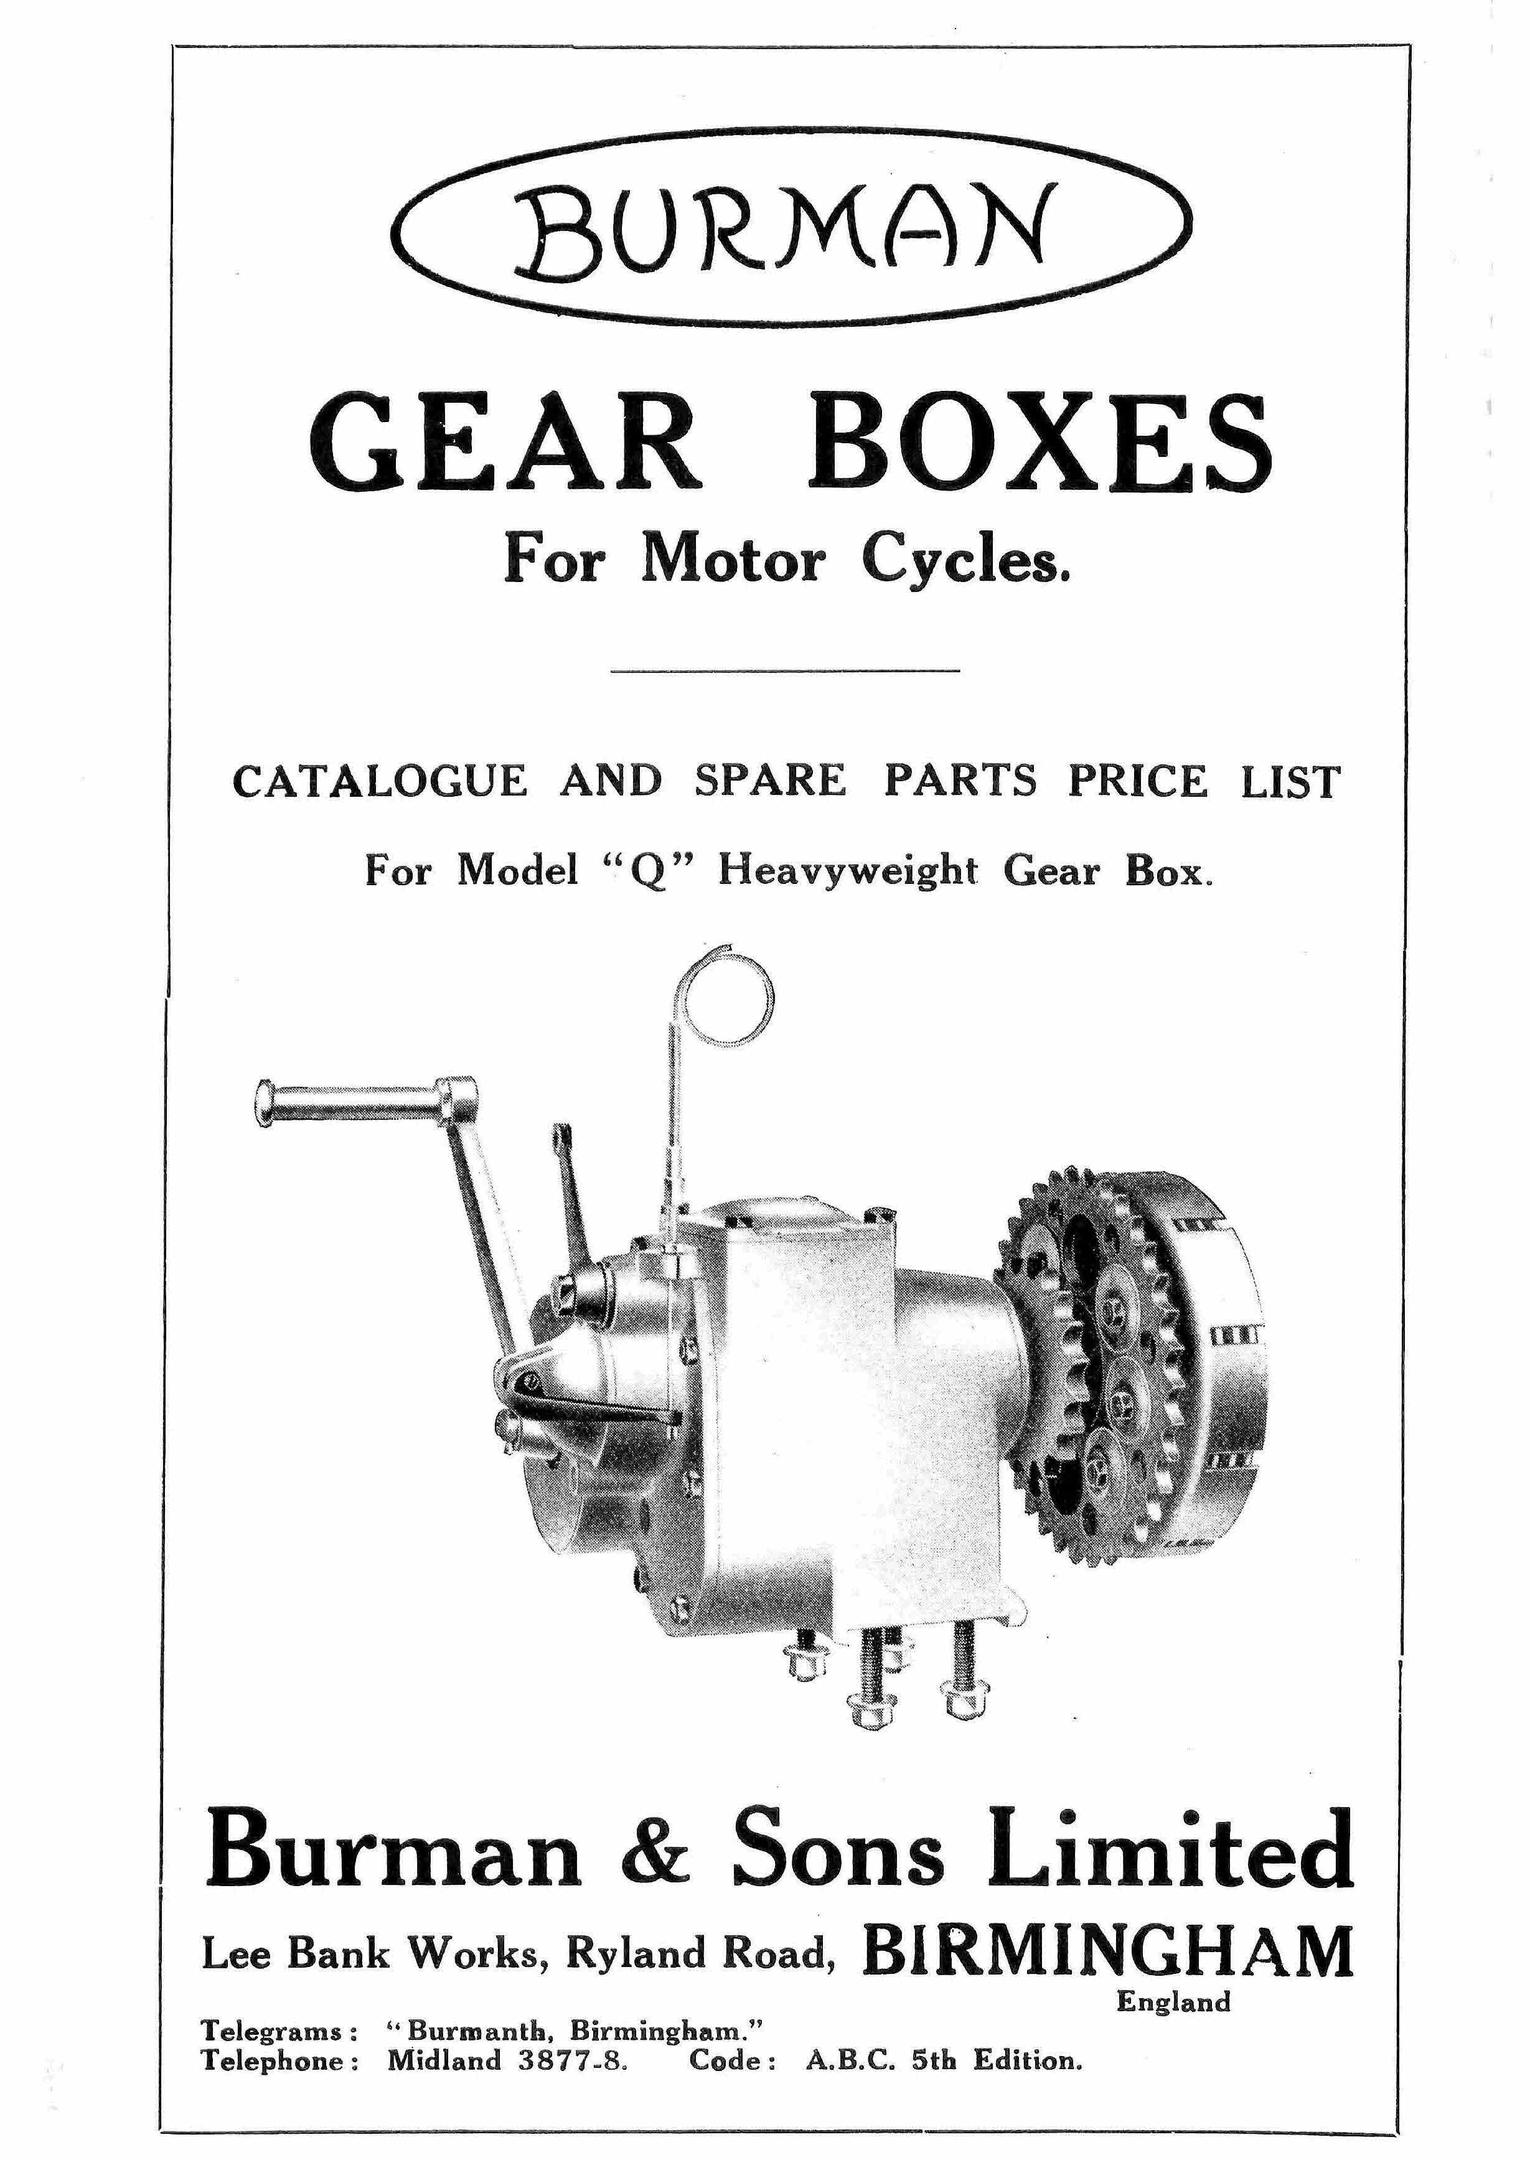 medium resolution of burman motorcycle gear box manuals themanualman mix gear box of motorcycle 19